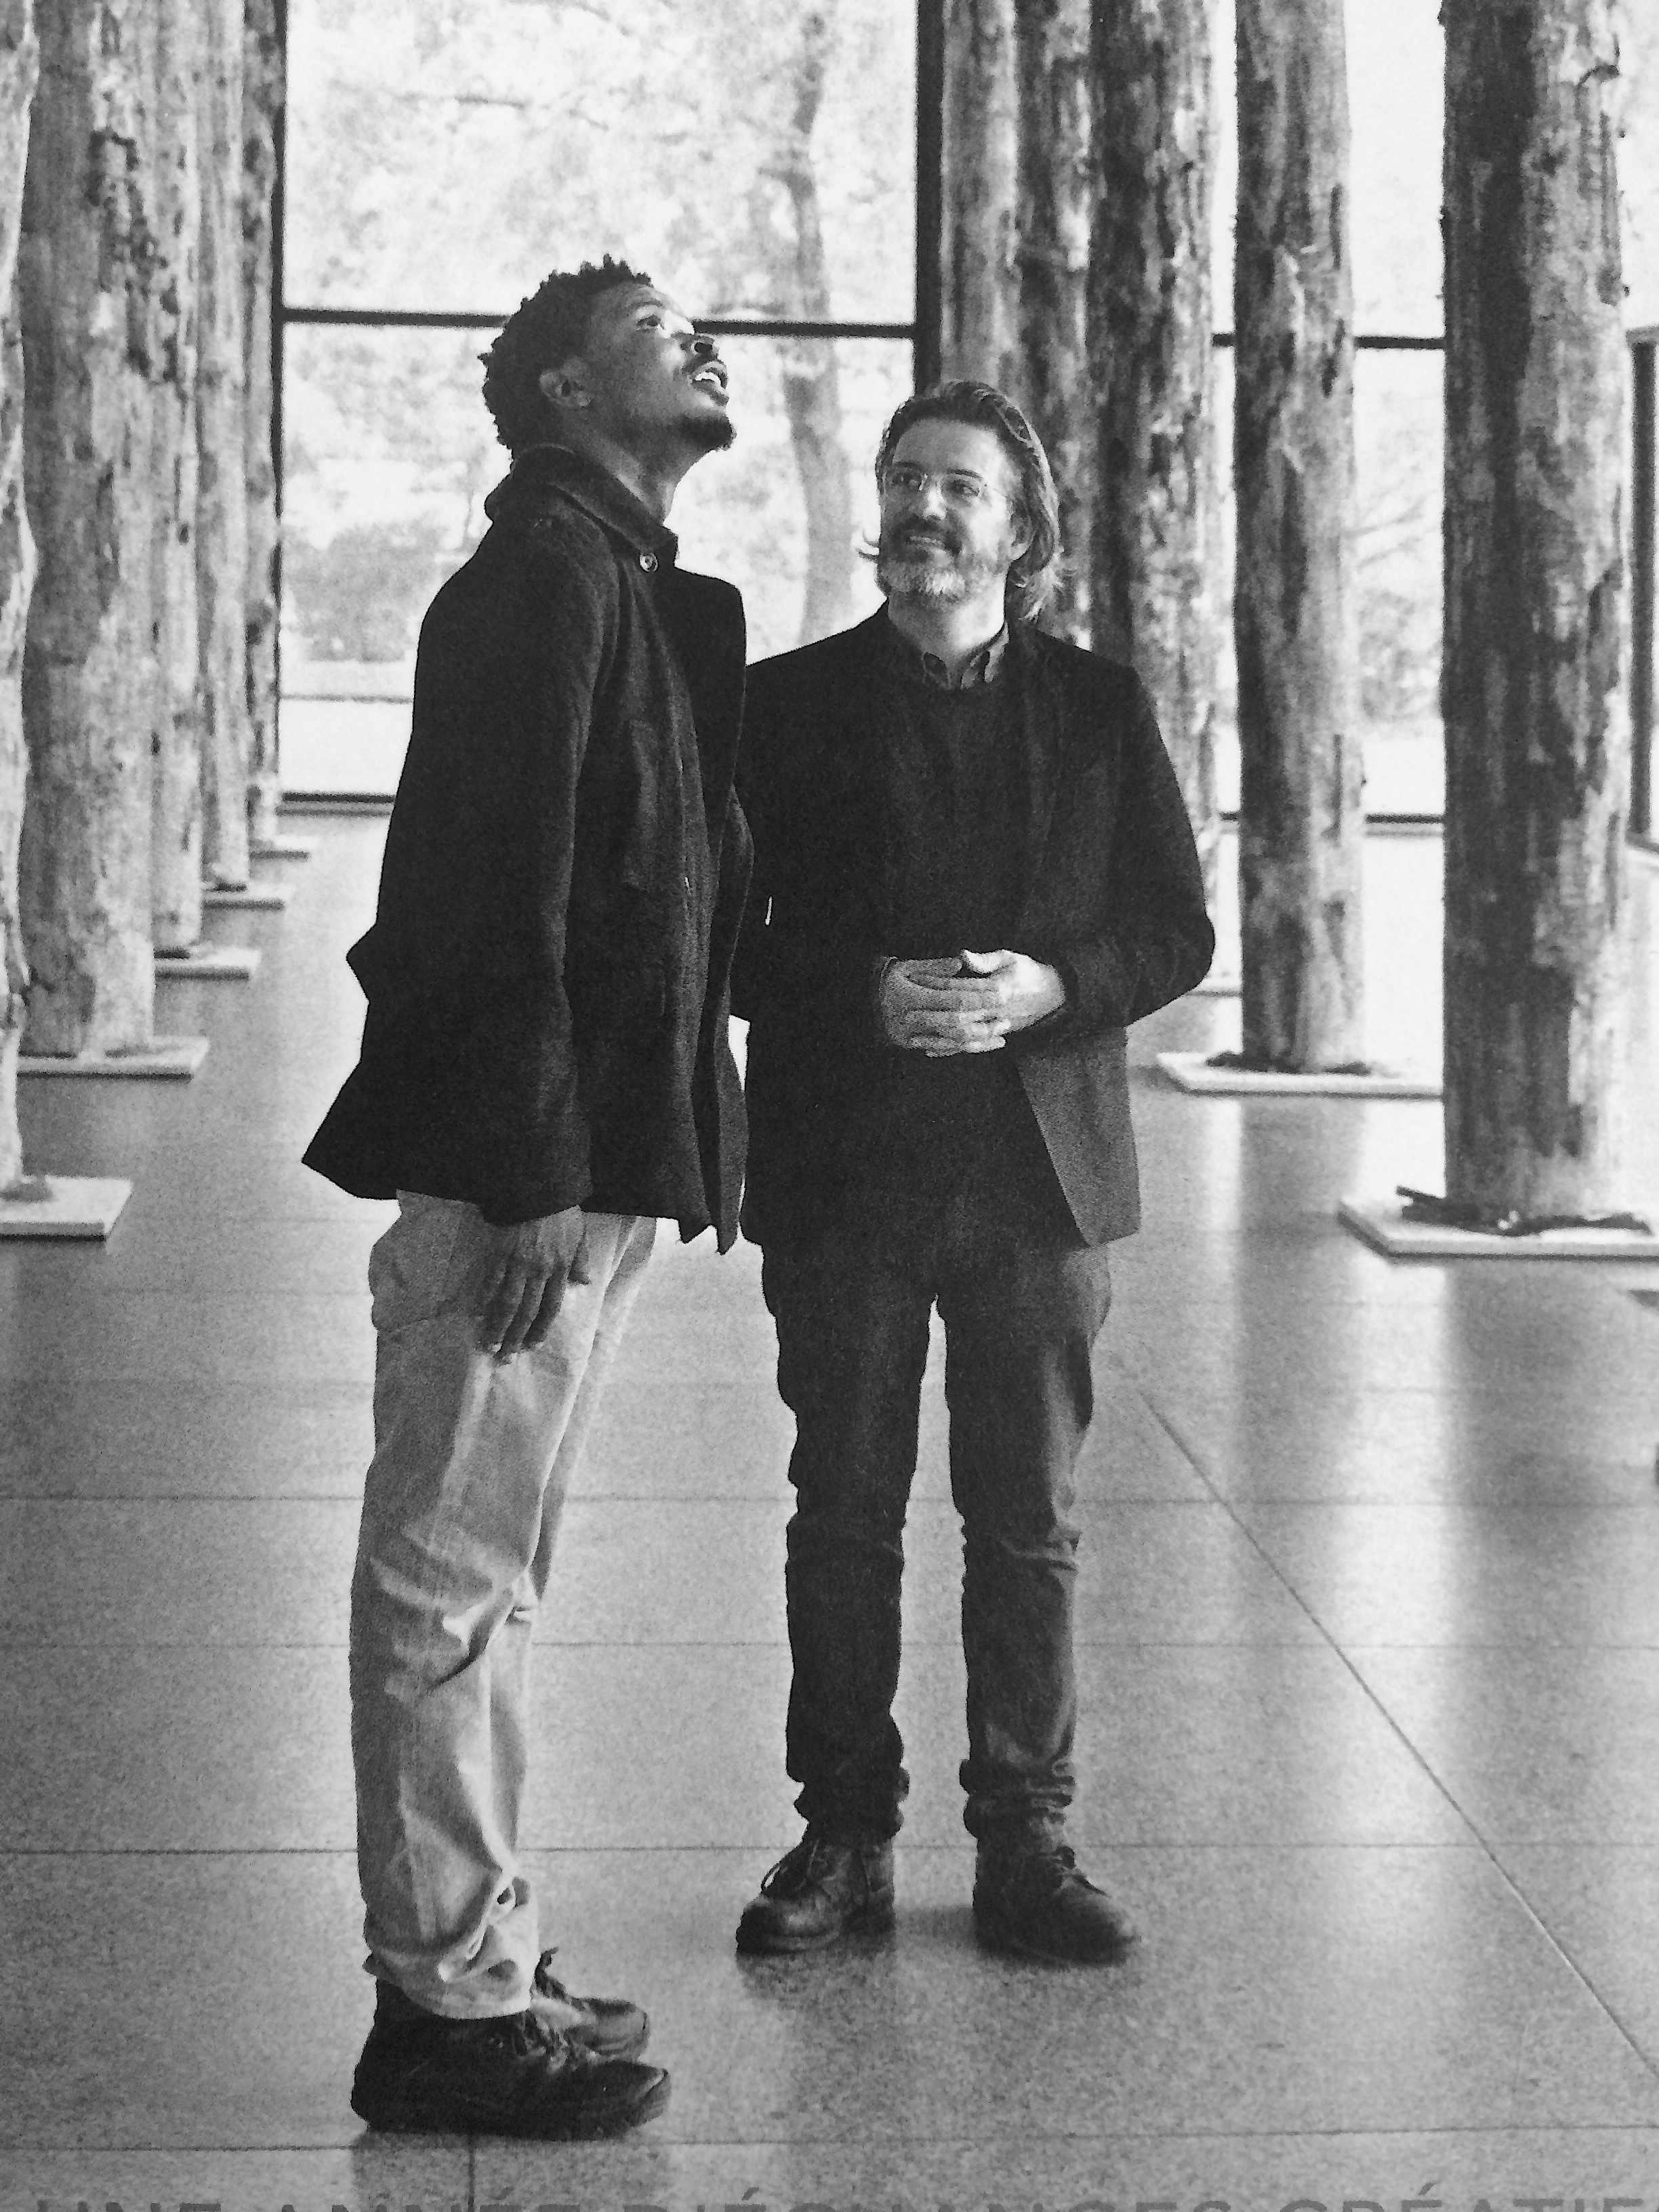 Sammy Baloji and Olafur Eliassonphotographed at the Neue Nationalgalerie inBerlin. ©Rolex/Tomas Bertelsen